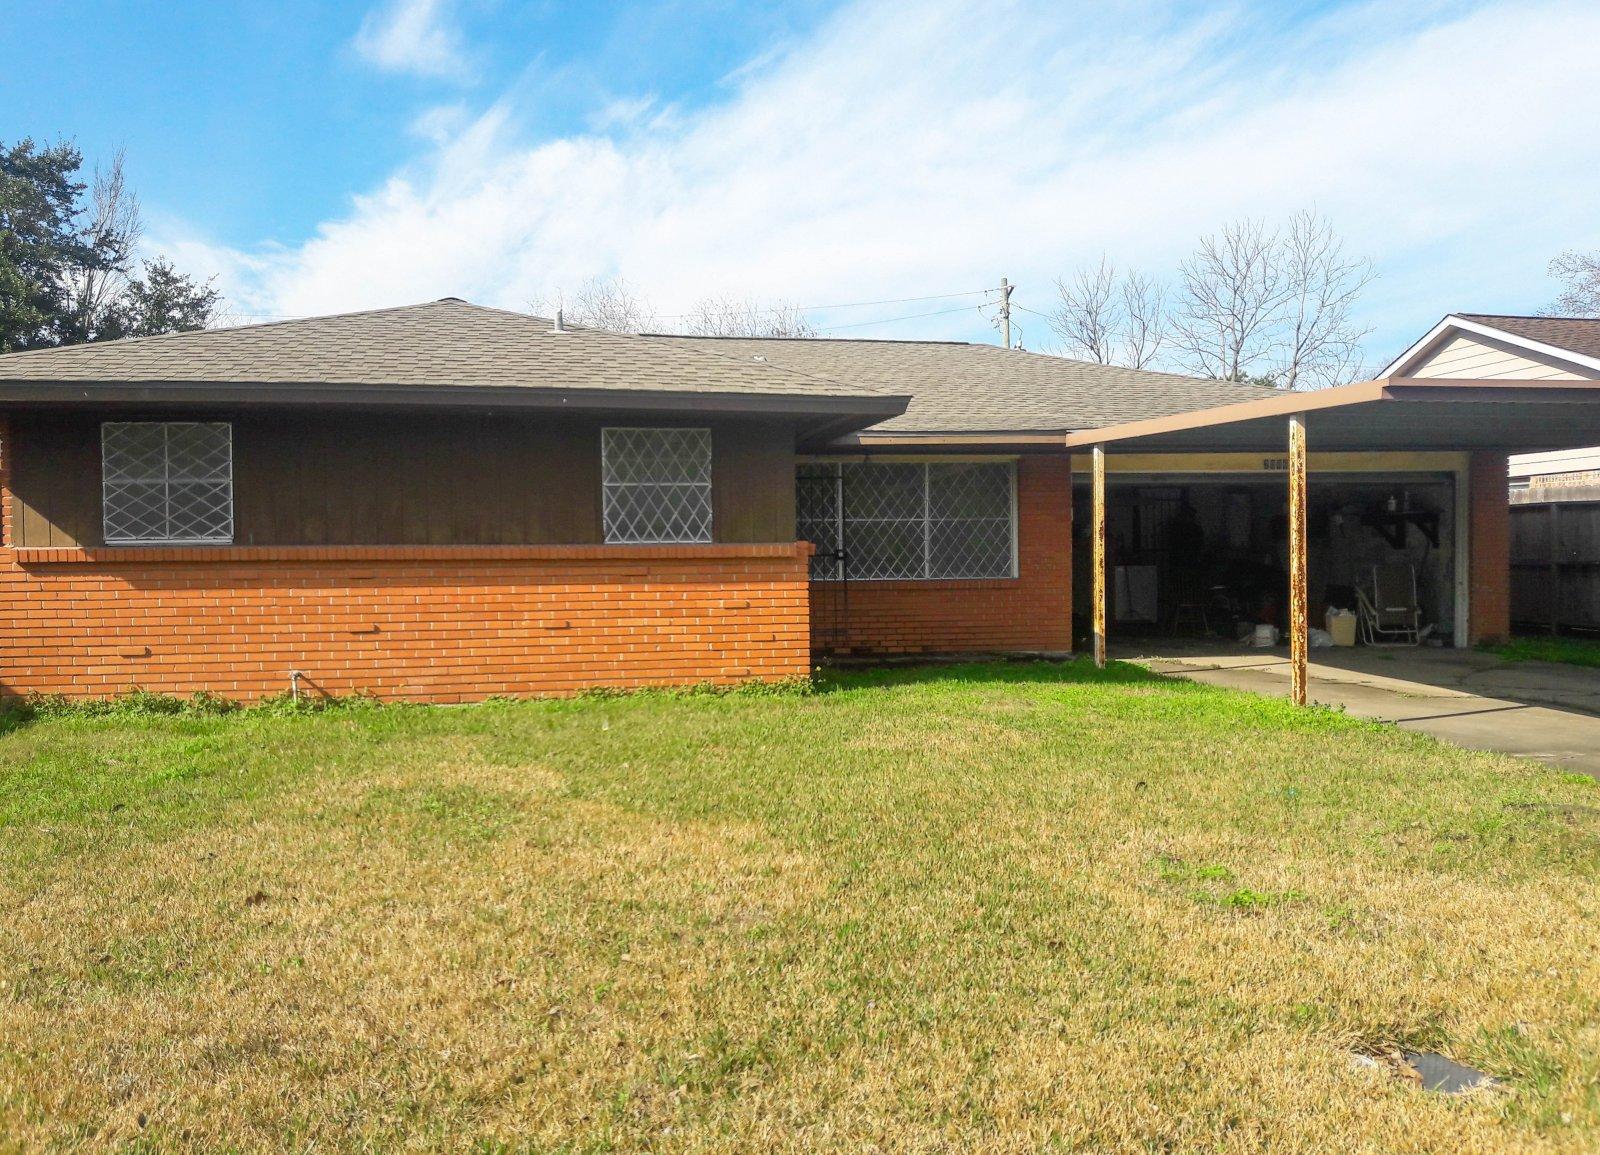 Homes For Sale In TX: Pasadena 77502 Basket 3BR